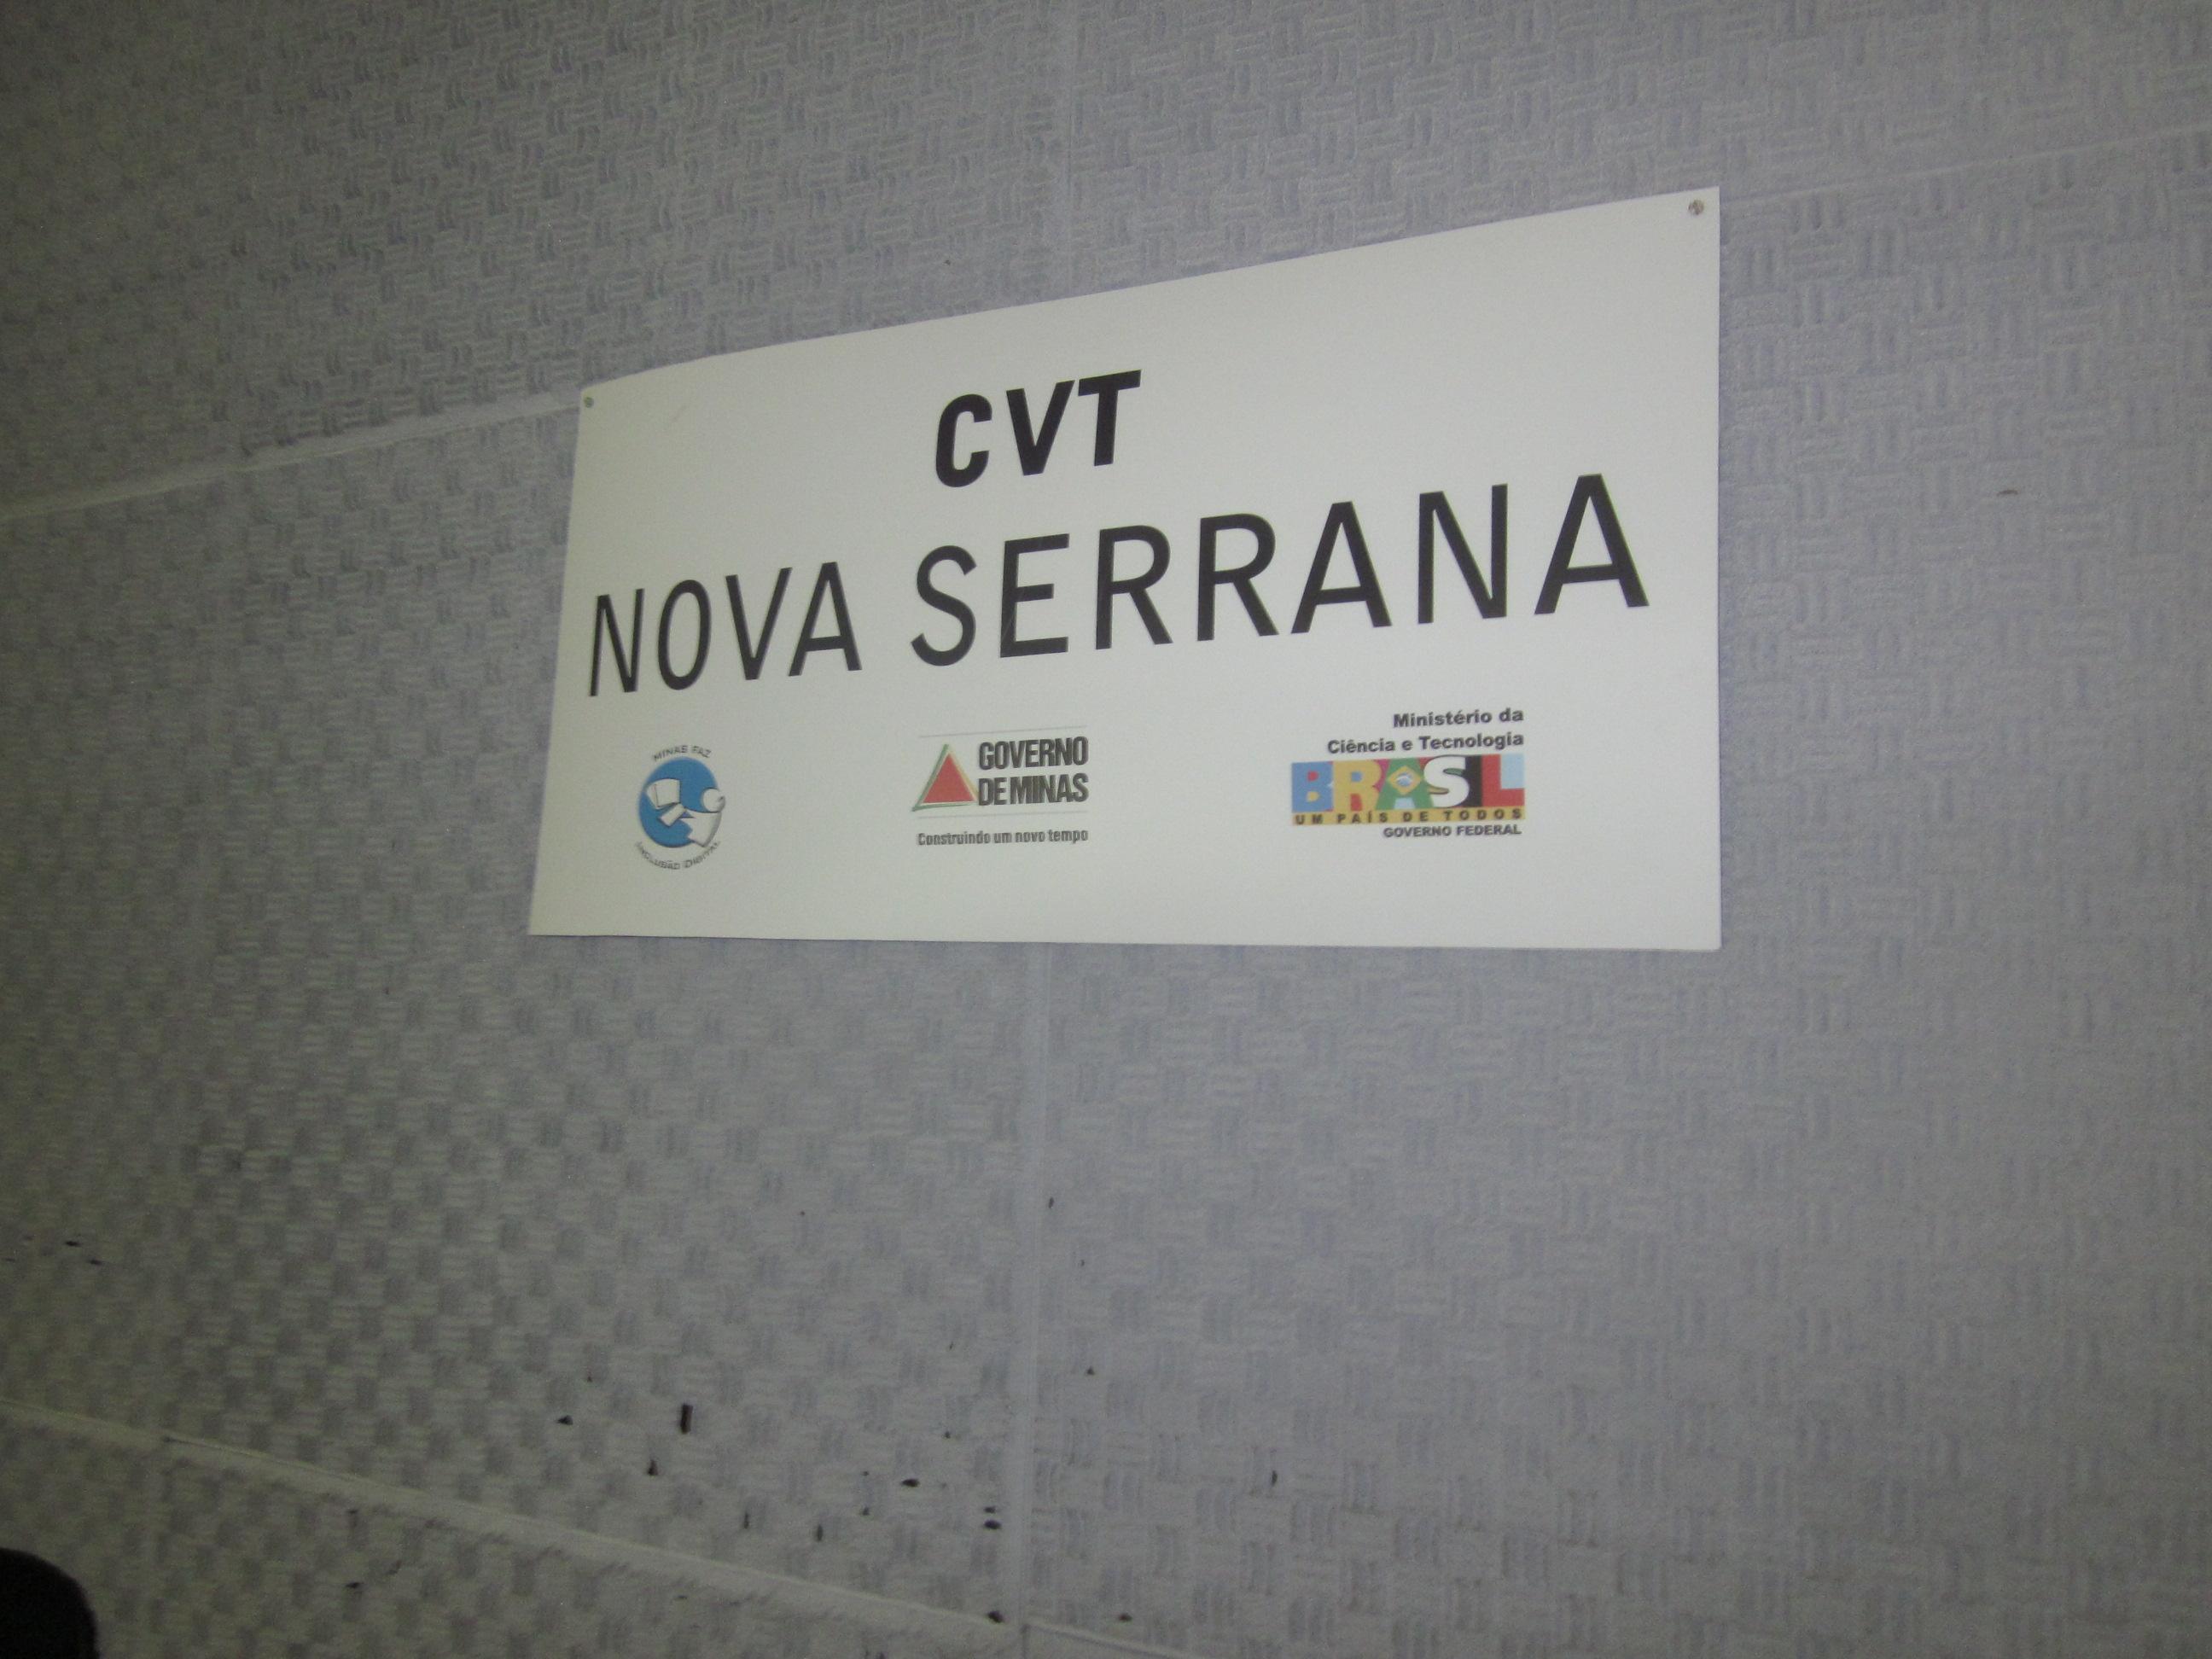 OFICINA EM NOVA SERRANA/MG (08/07/12)